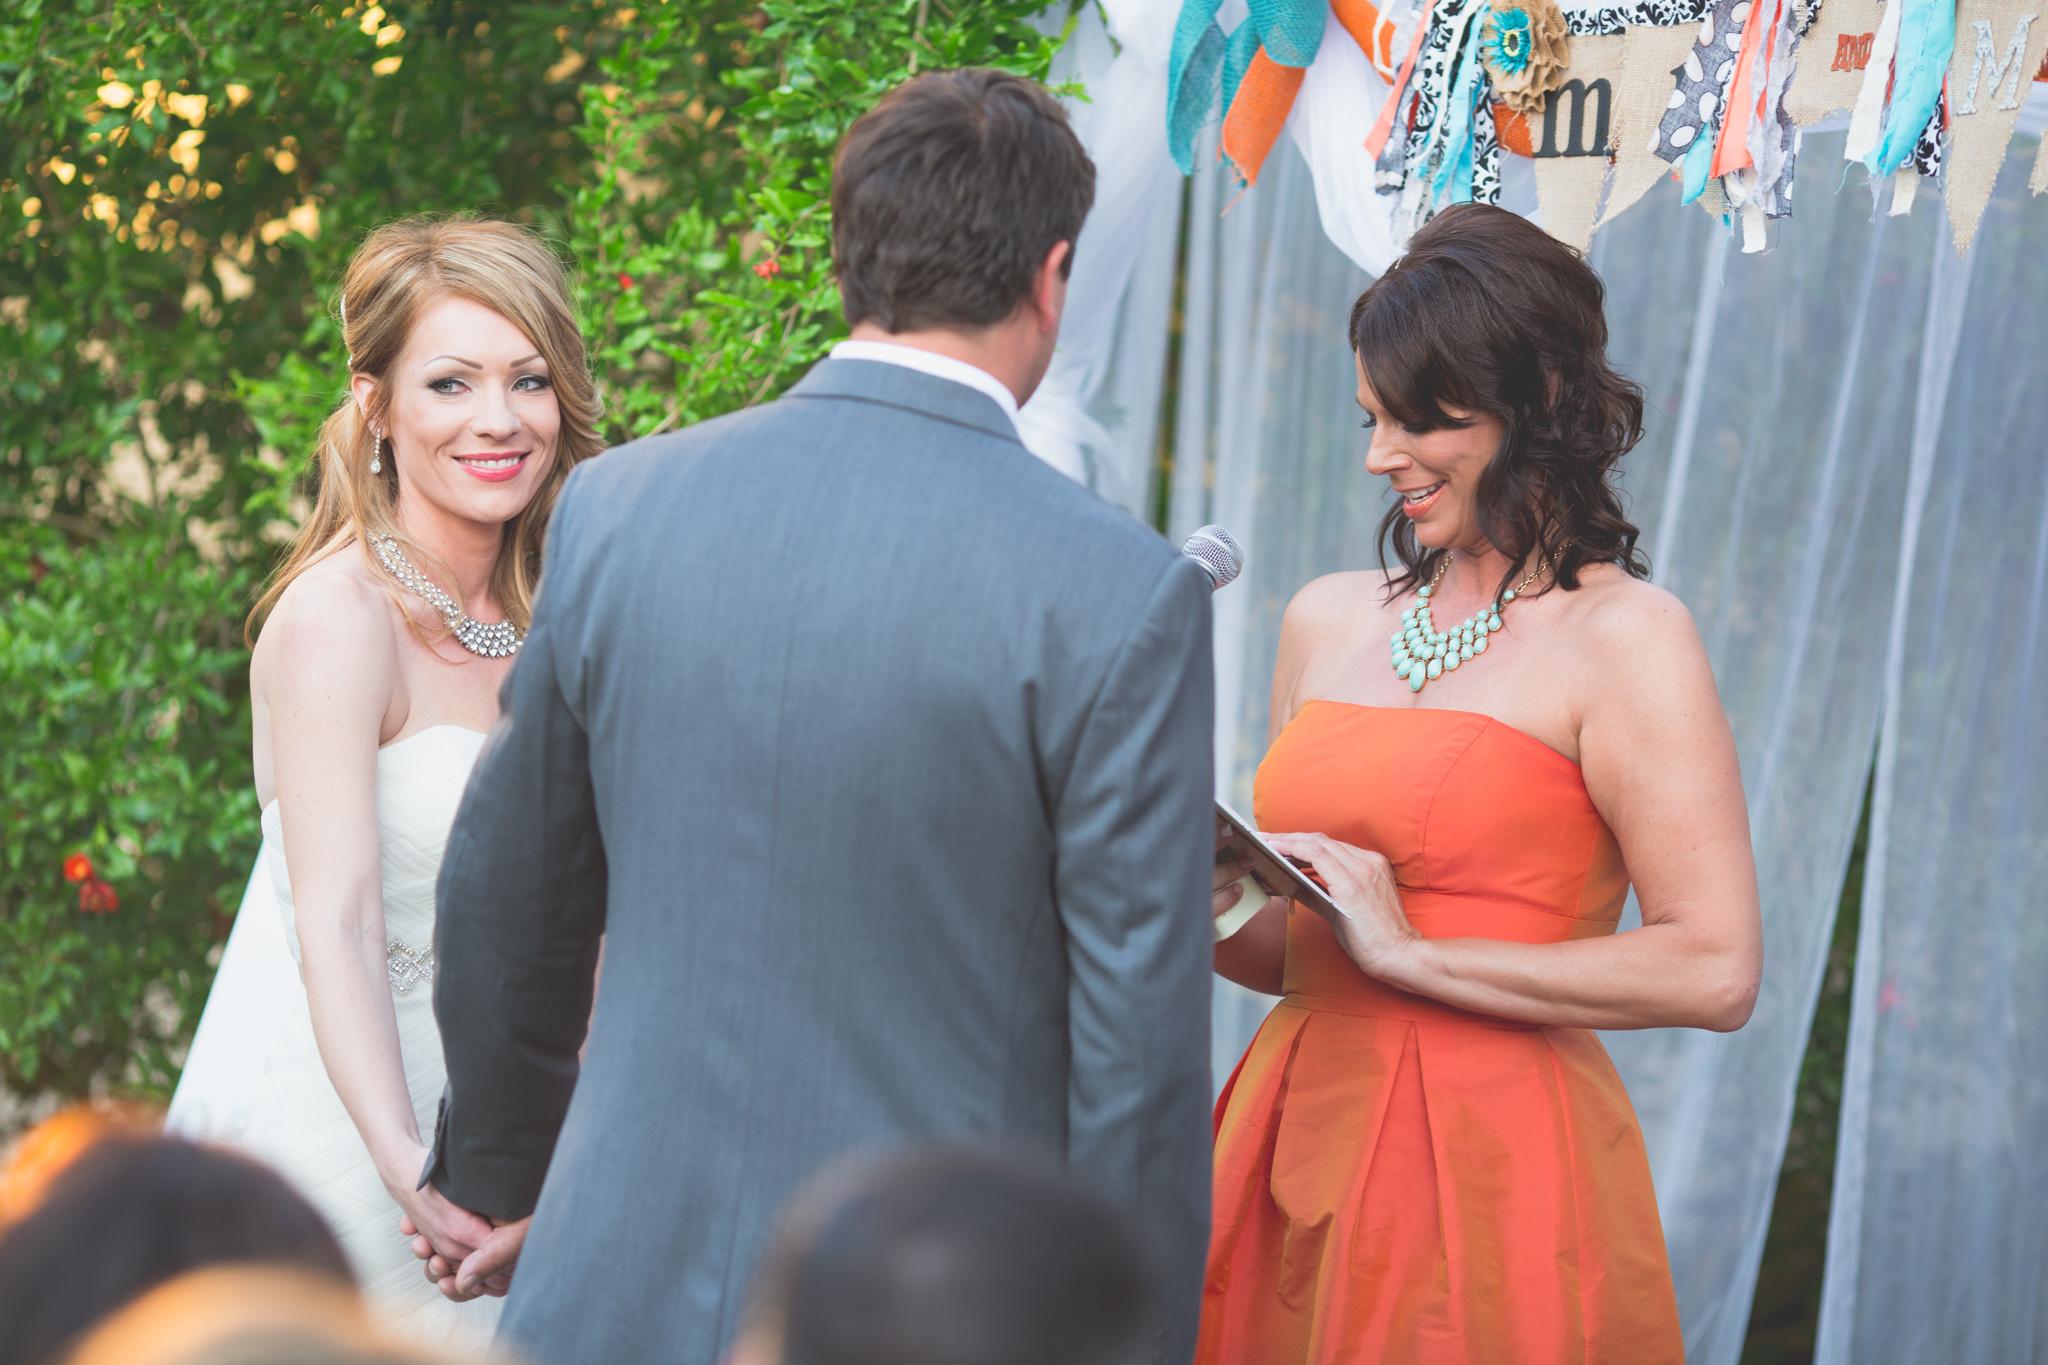 arizona-wedding-photography-smiling-bride-ceremony